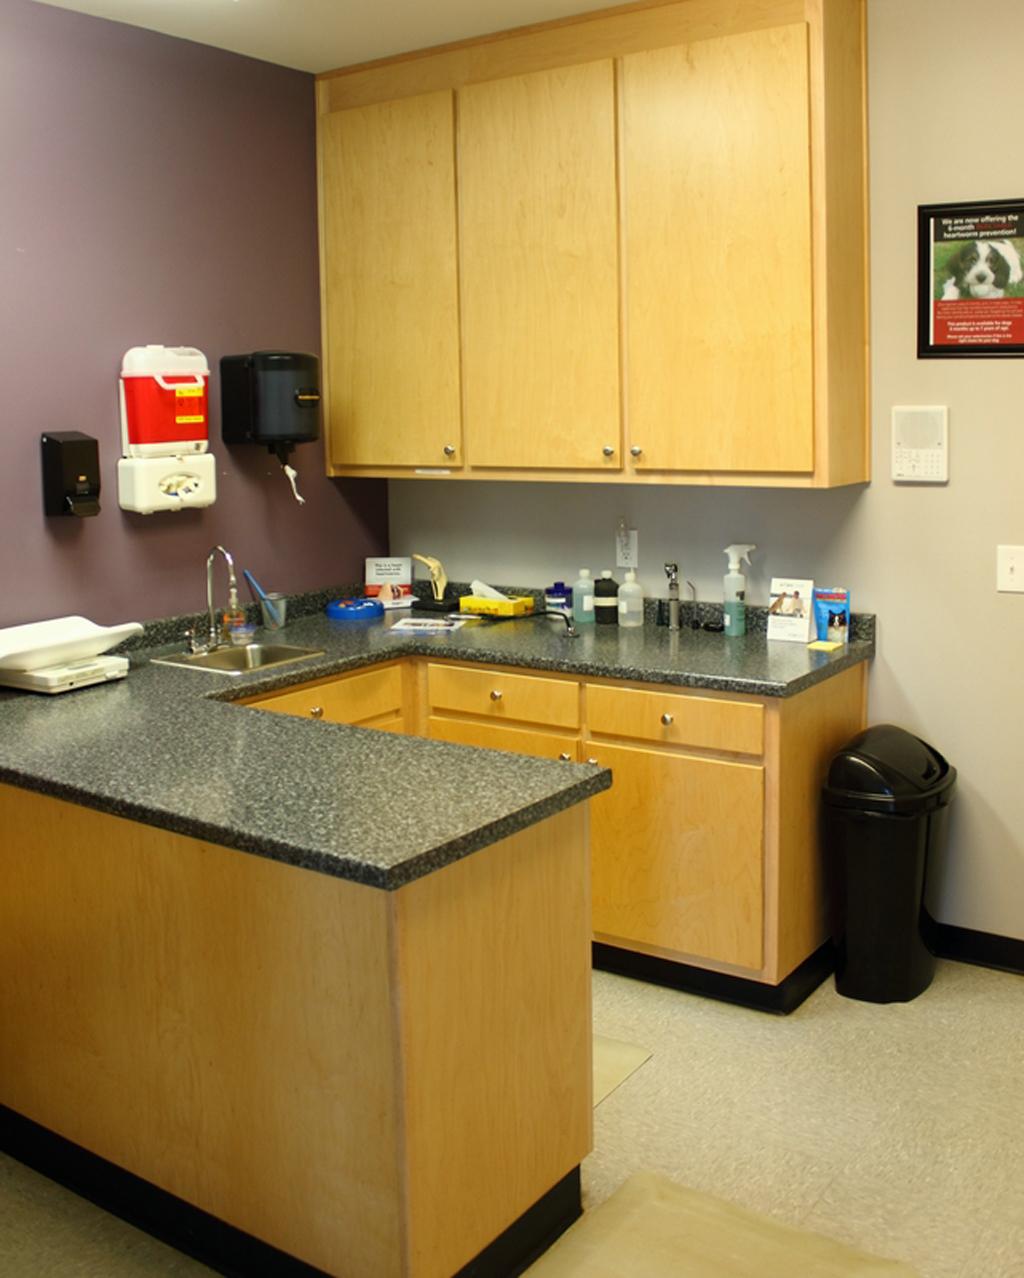 VCA Chestatee Animal Hospital image 1